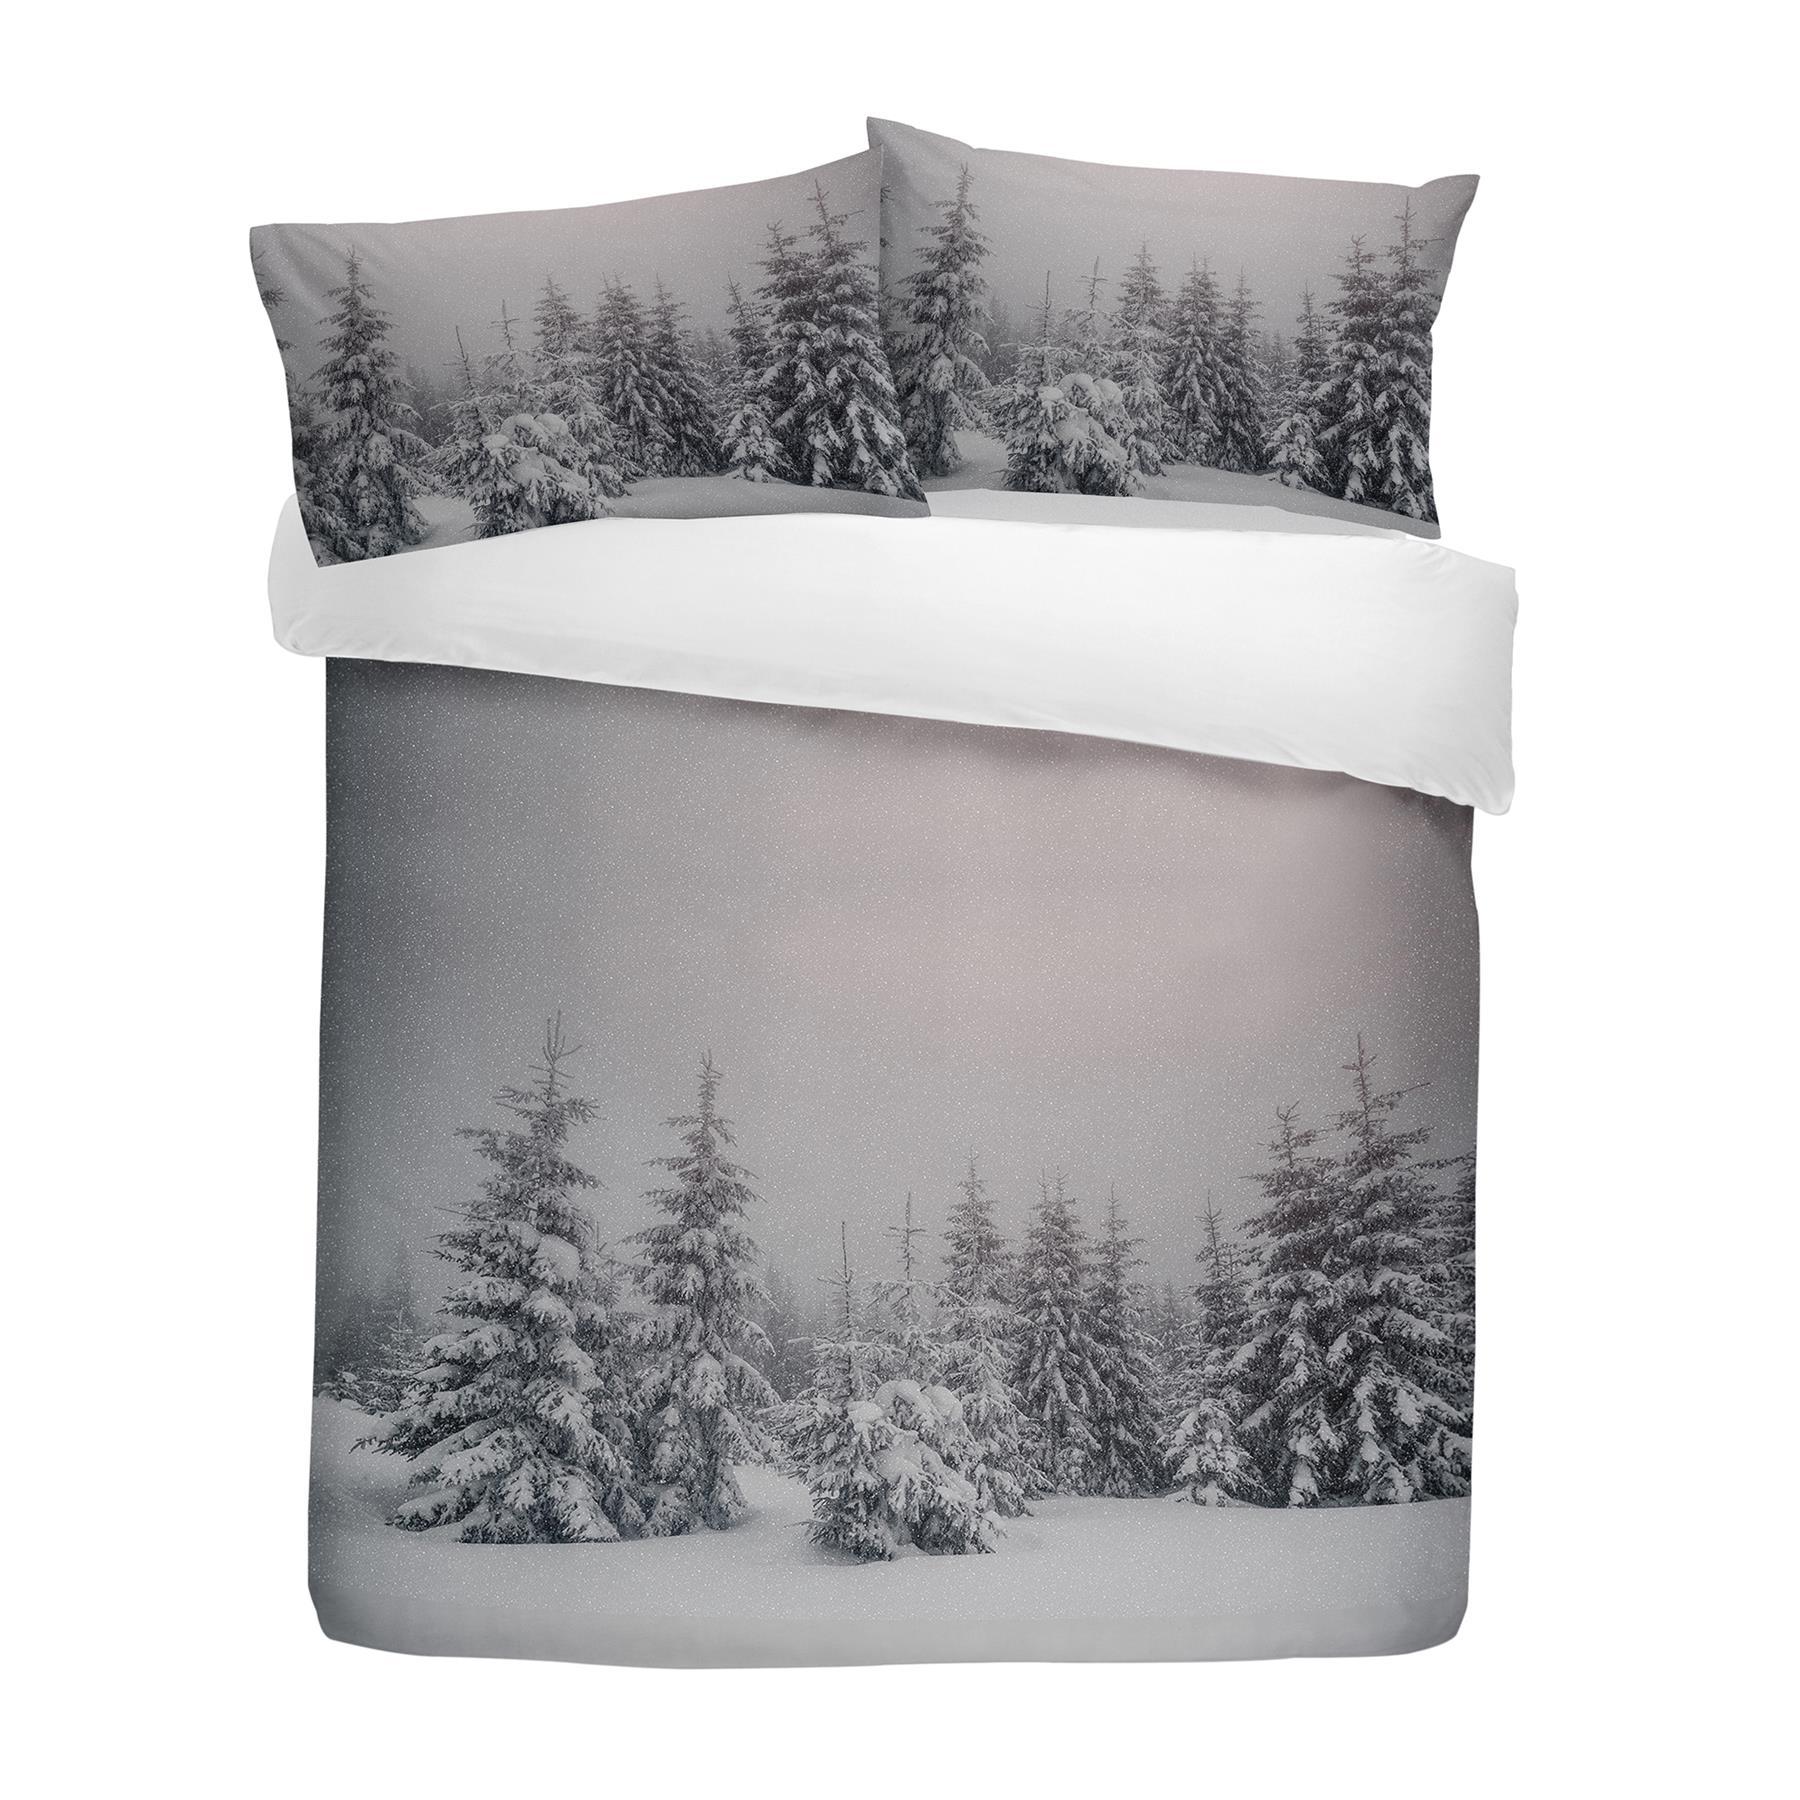 CHRISTMAS SNOWING STARRY NIGHT TREE SCENE SINGLE DUVET COVER